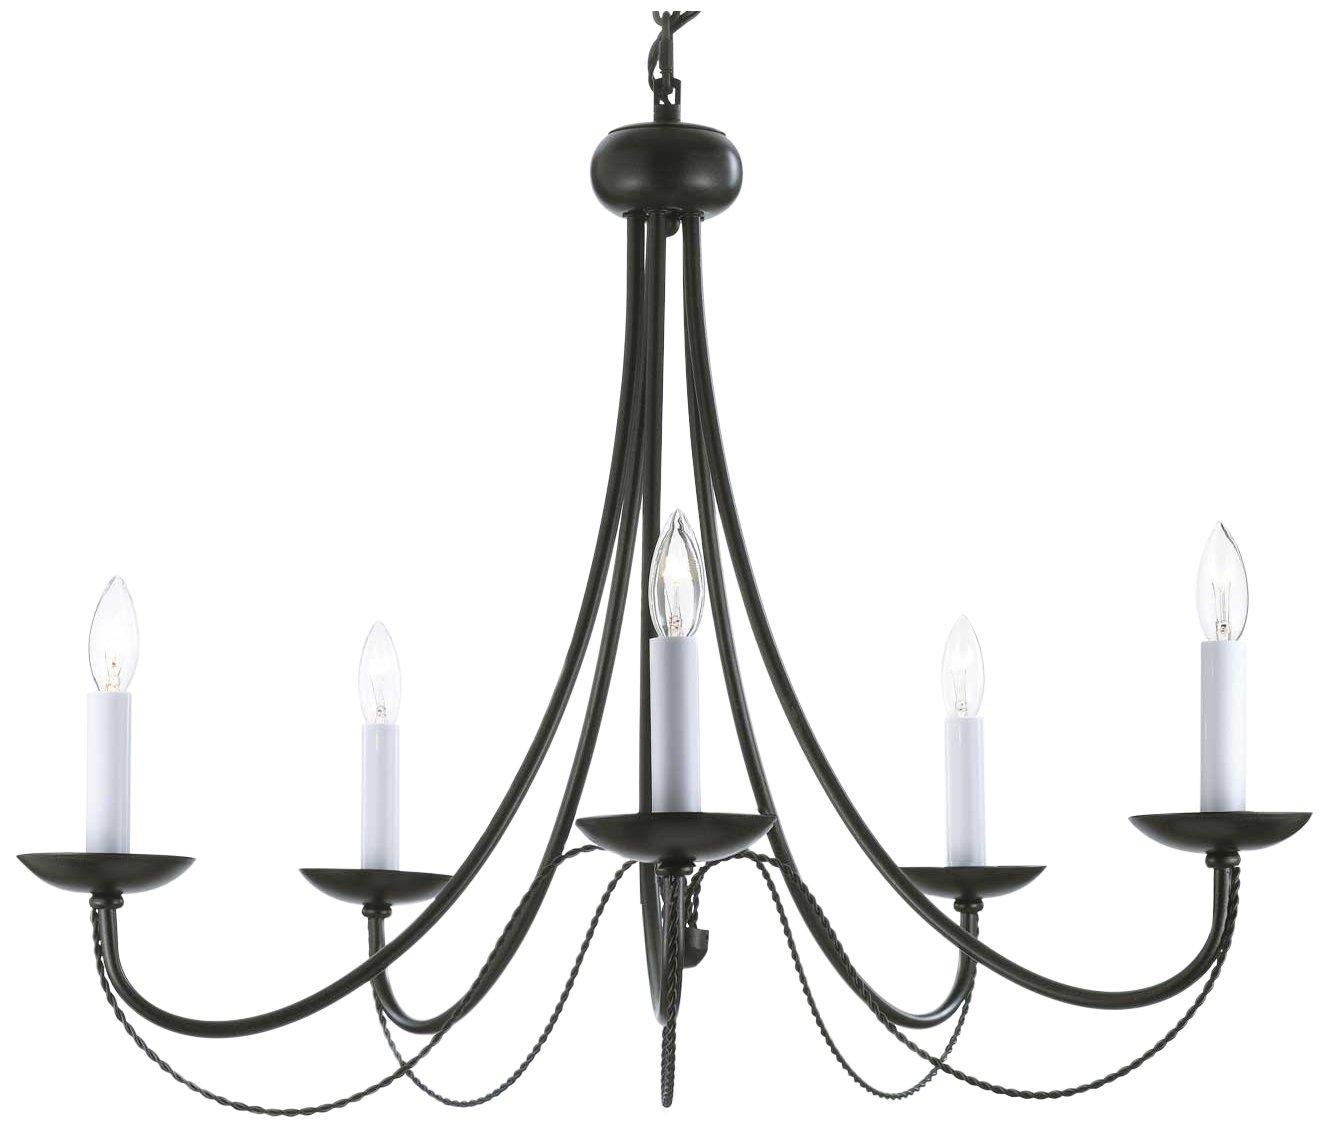 Wrought iron chandelier chandeliers lighting h22 x w26 amazon arubaitofo Images